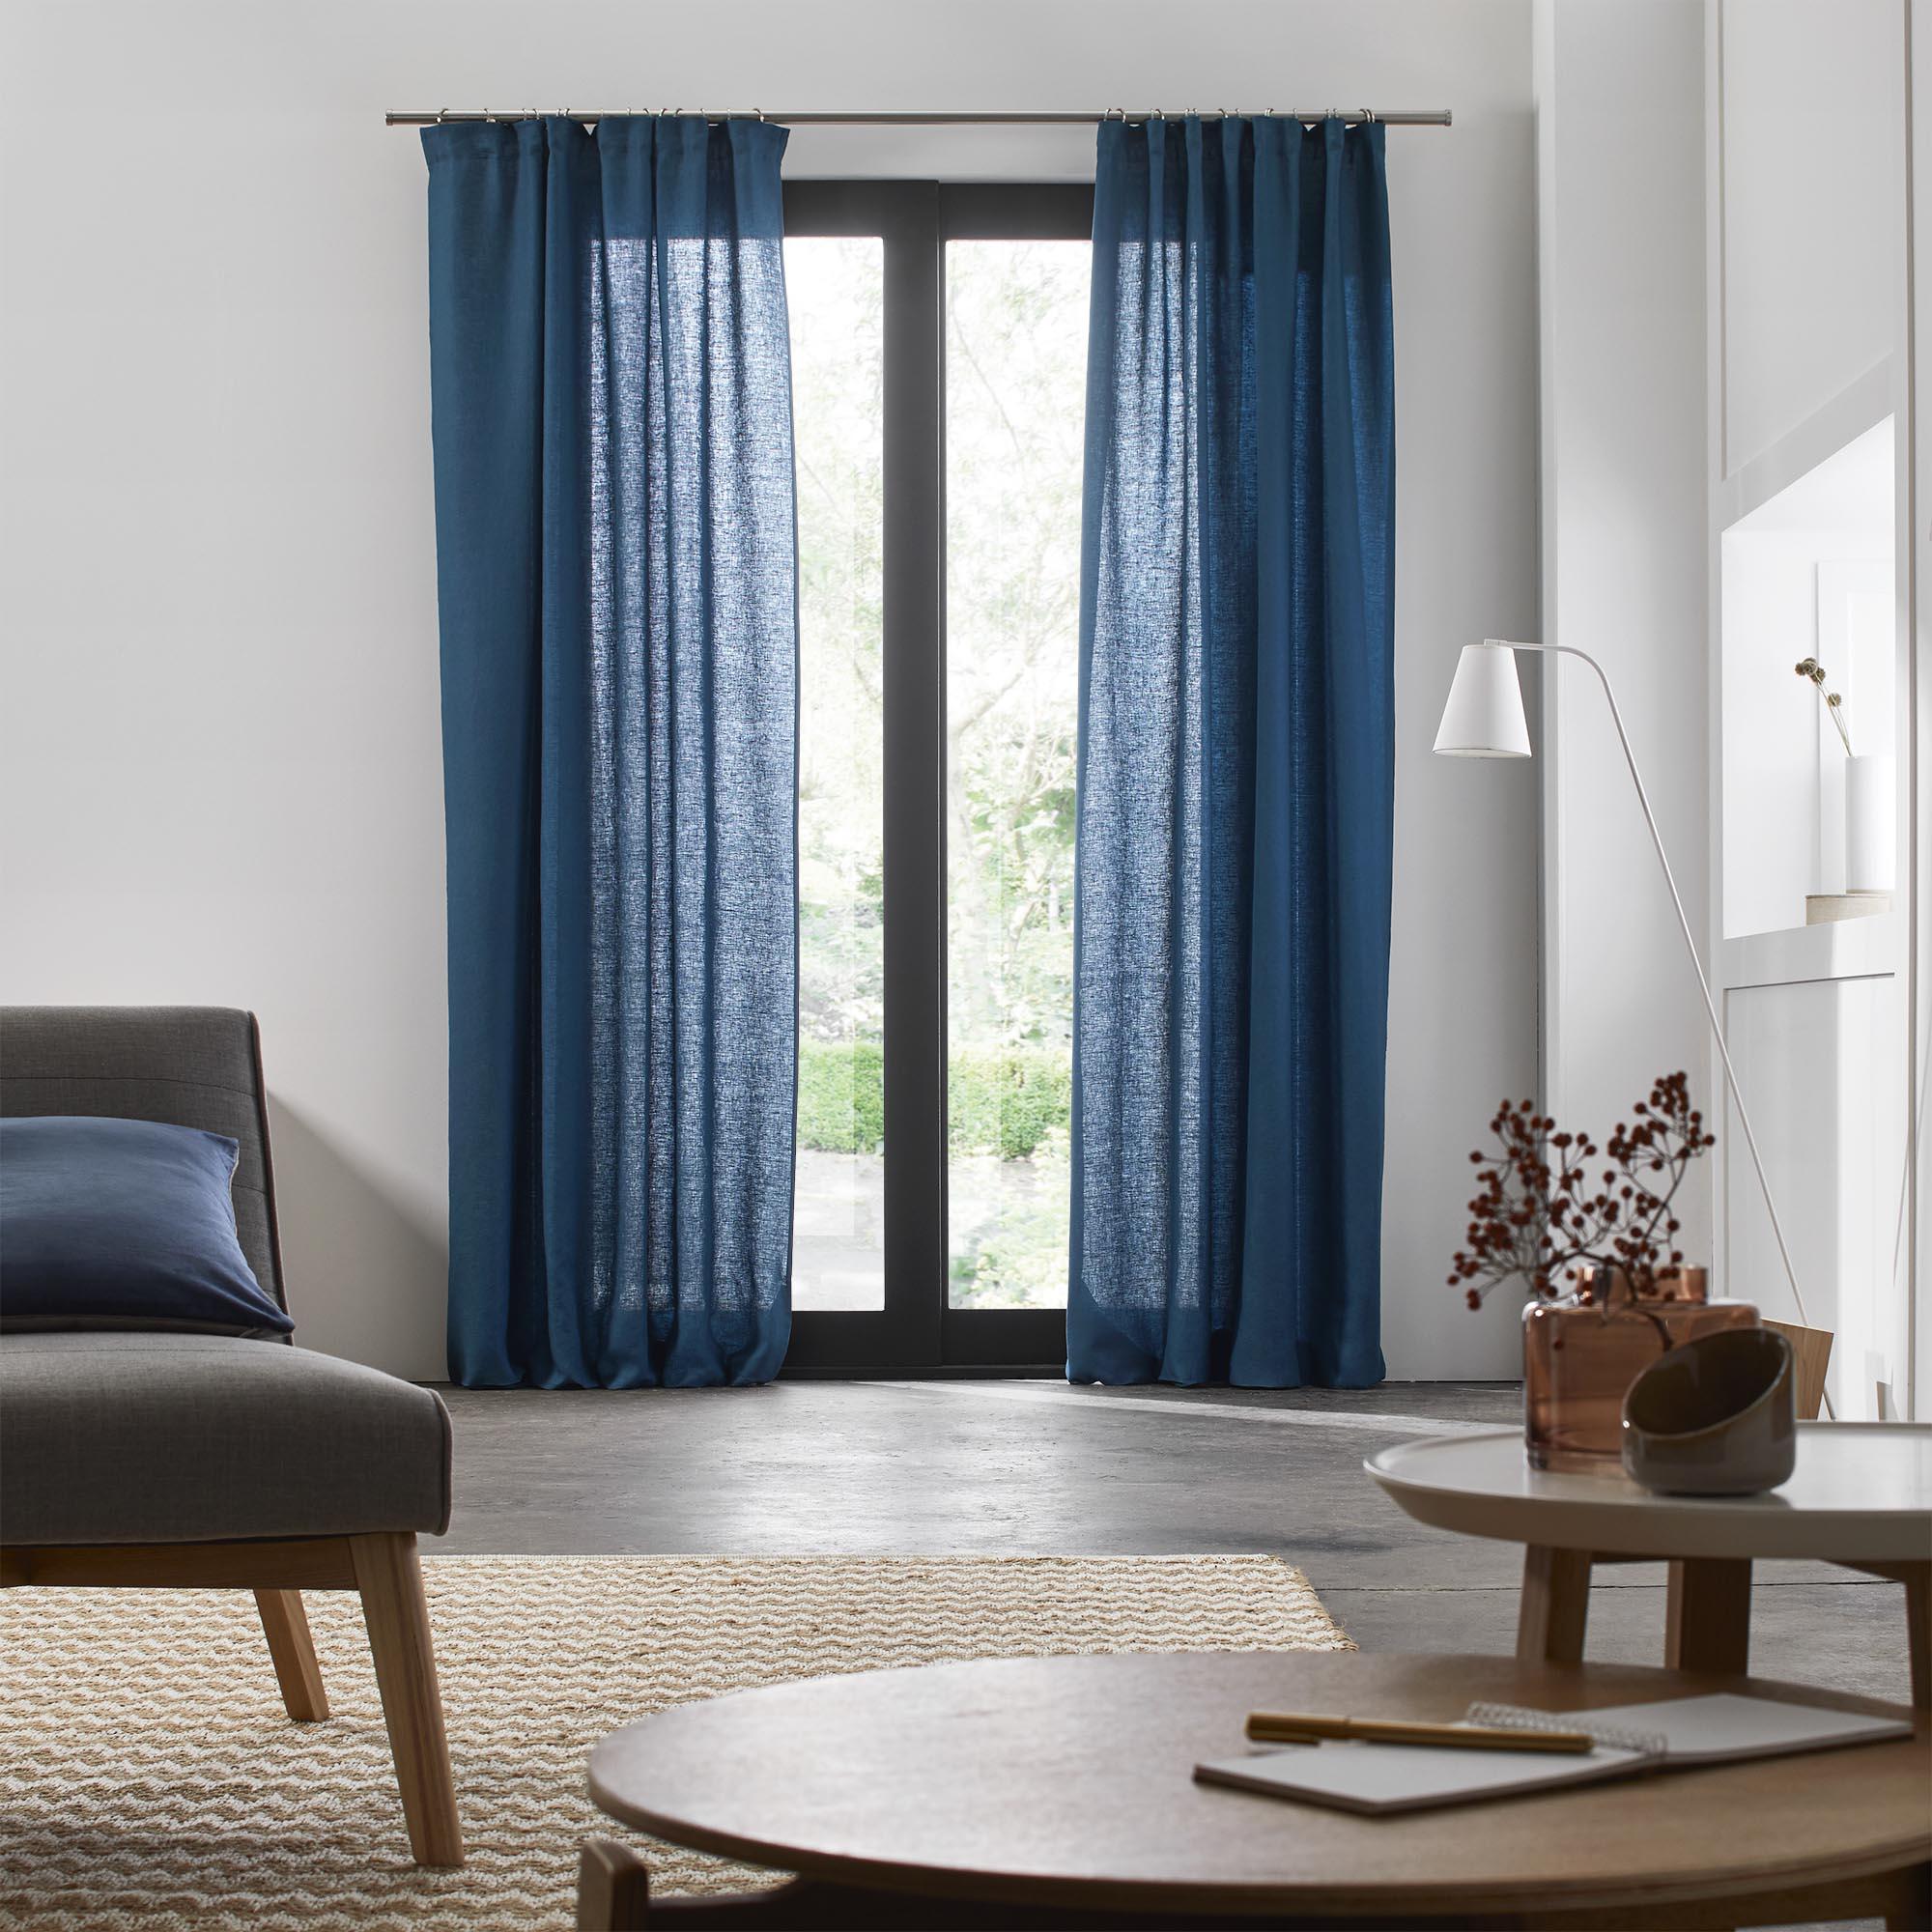 Rideau à ruban fronceur 200x280 cm Bleu vert en Lin